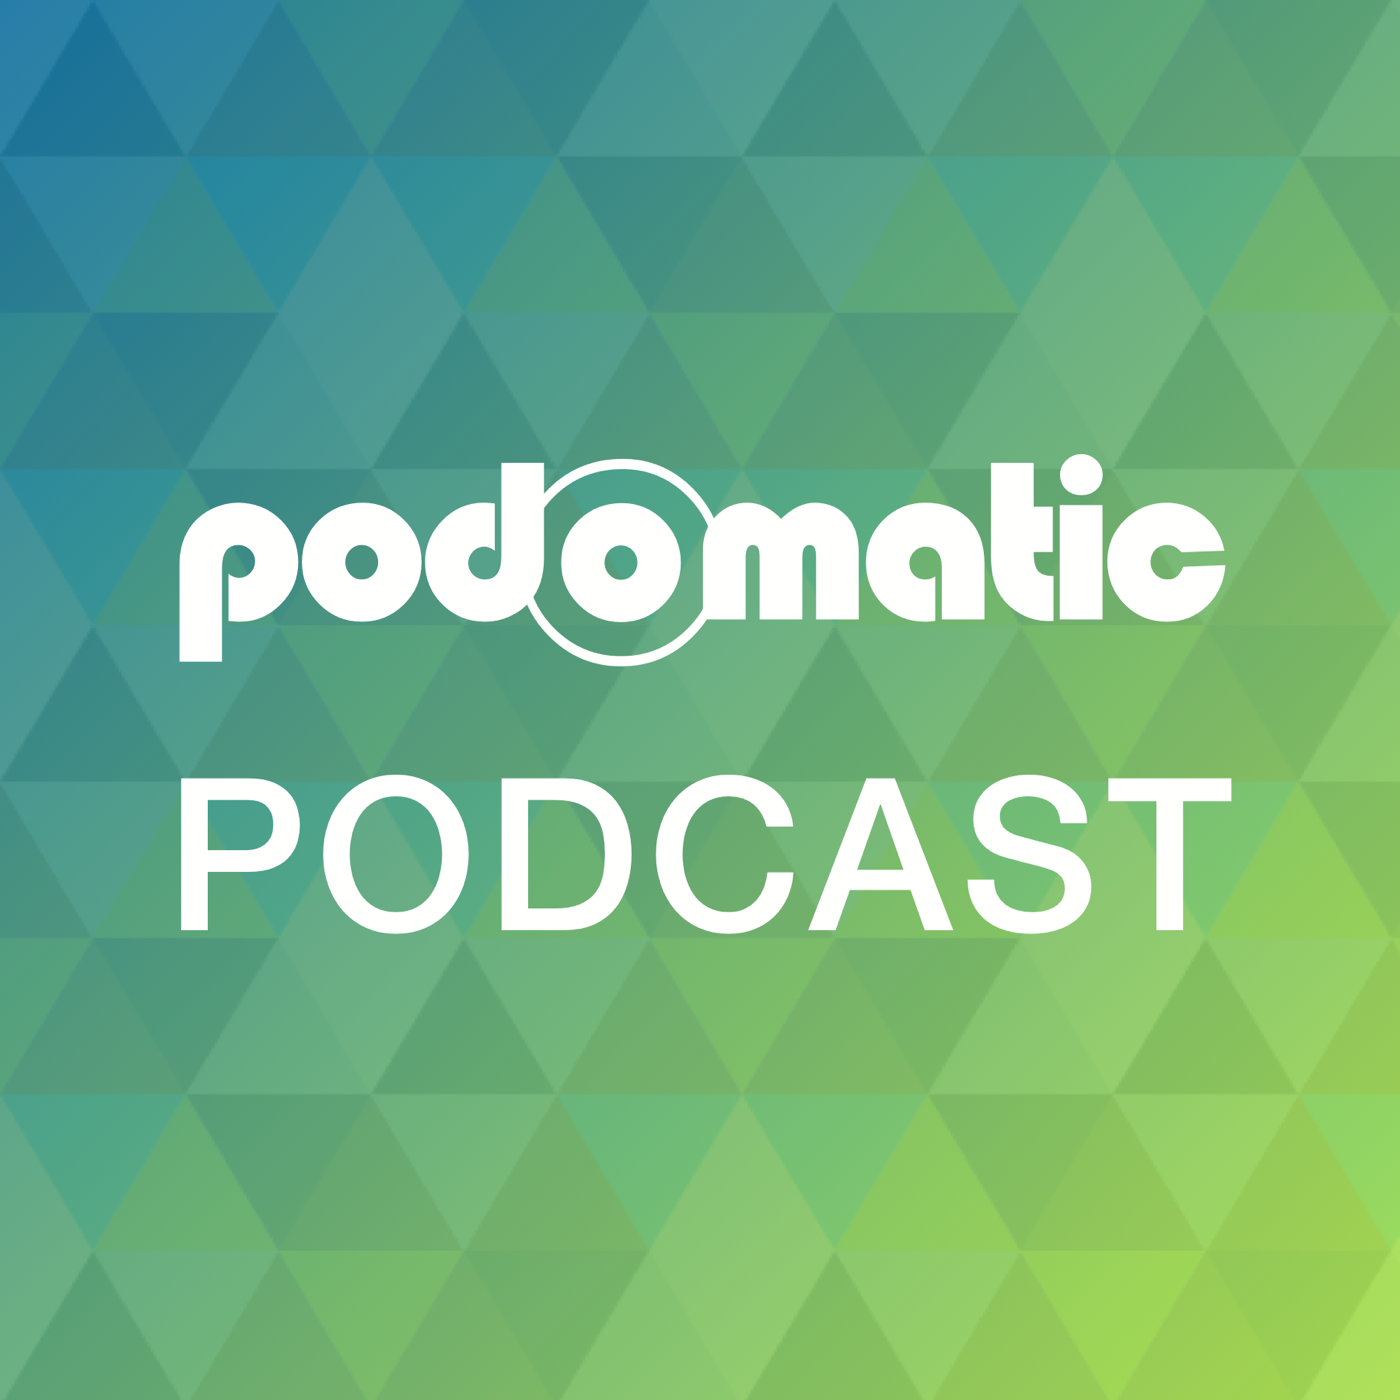 Gareth Chapman's Podcast